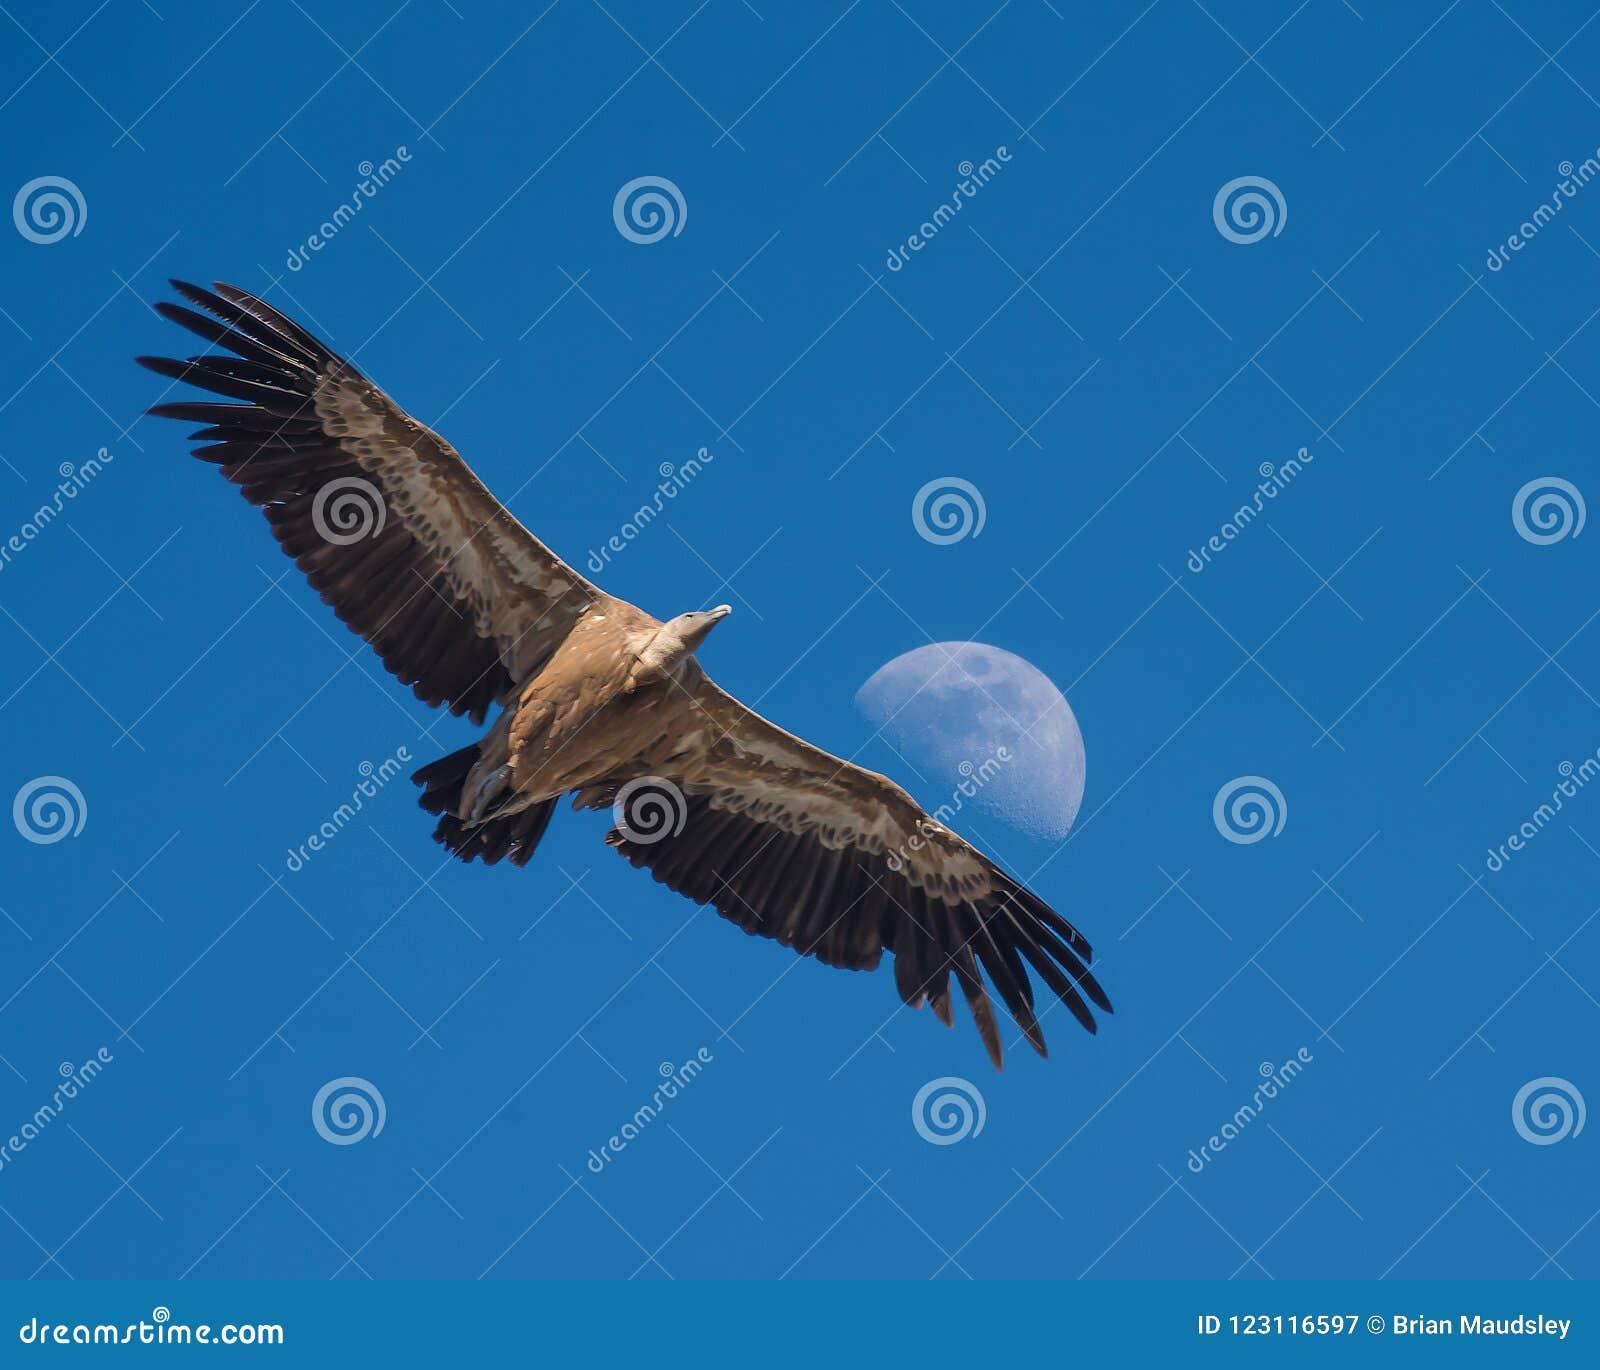 Griffon Vulture gliding against a daytime half Moon, Monfrague,